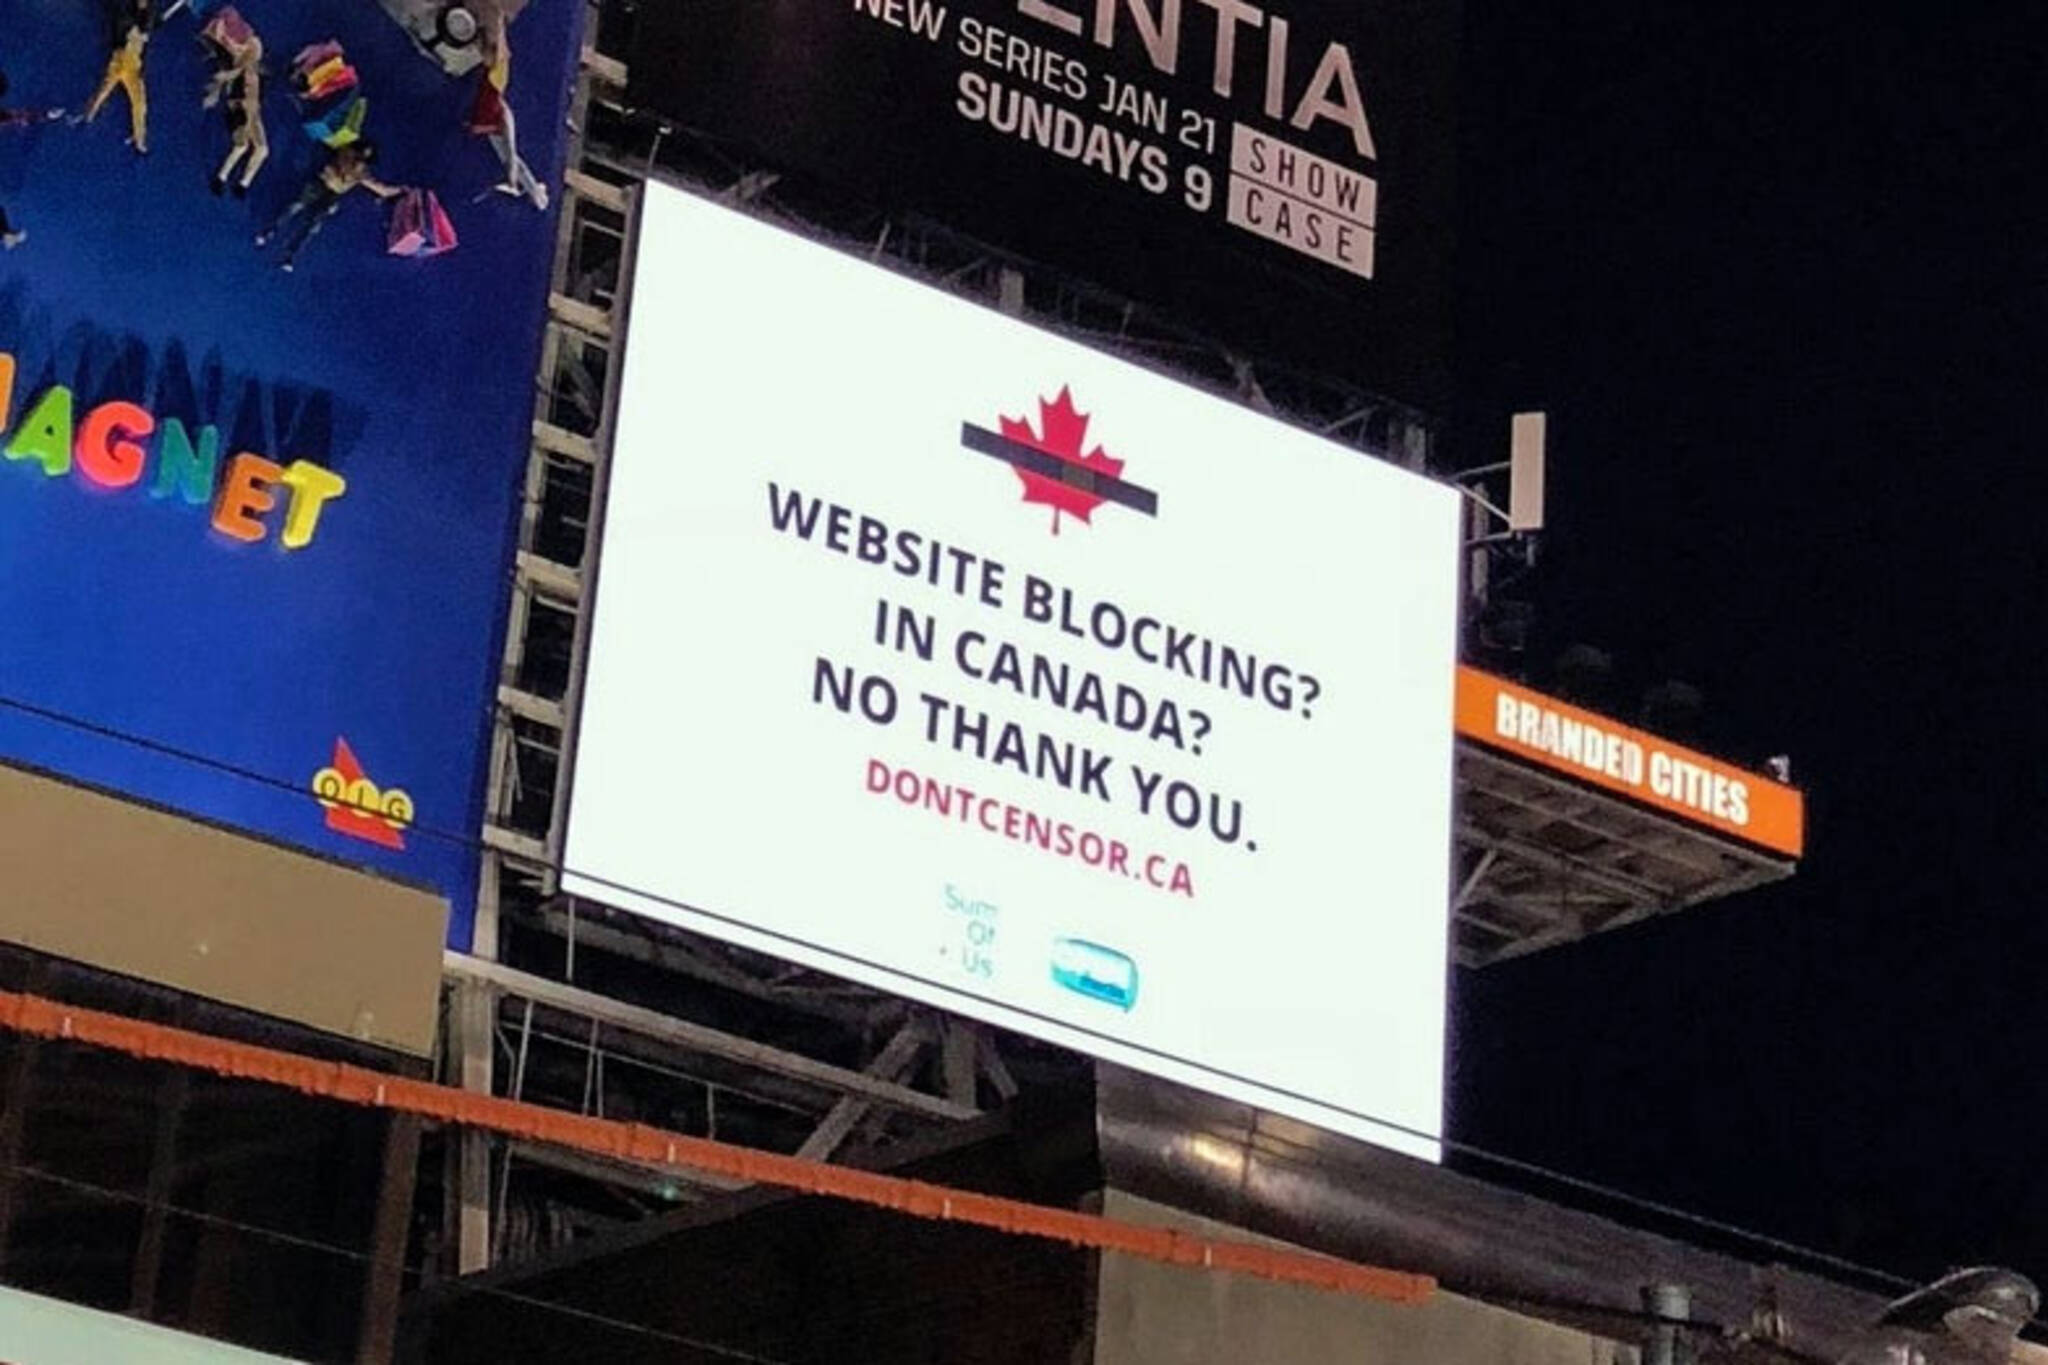 Internet censorship Canada